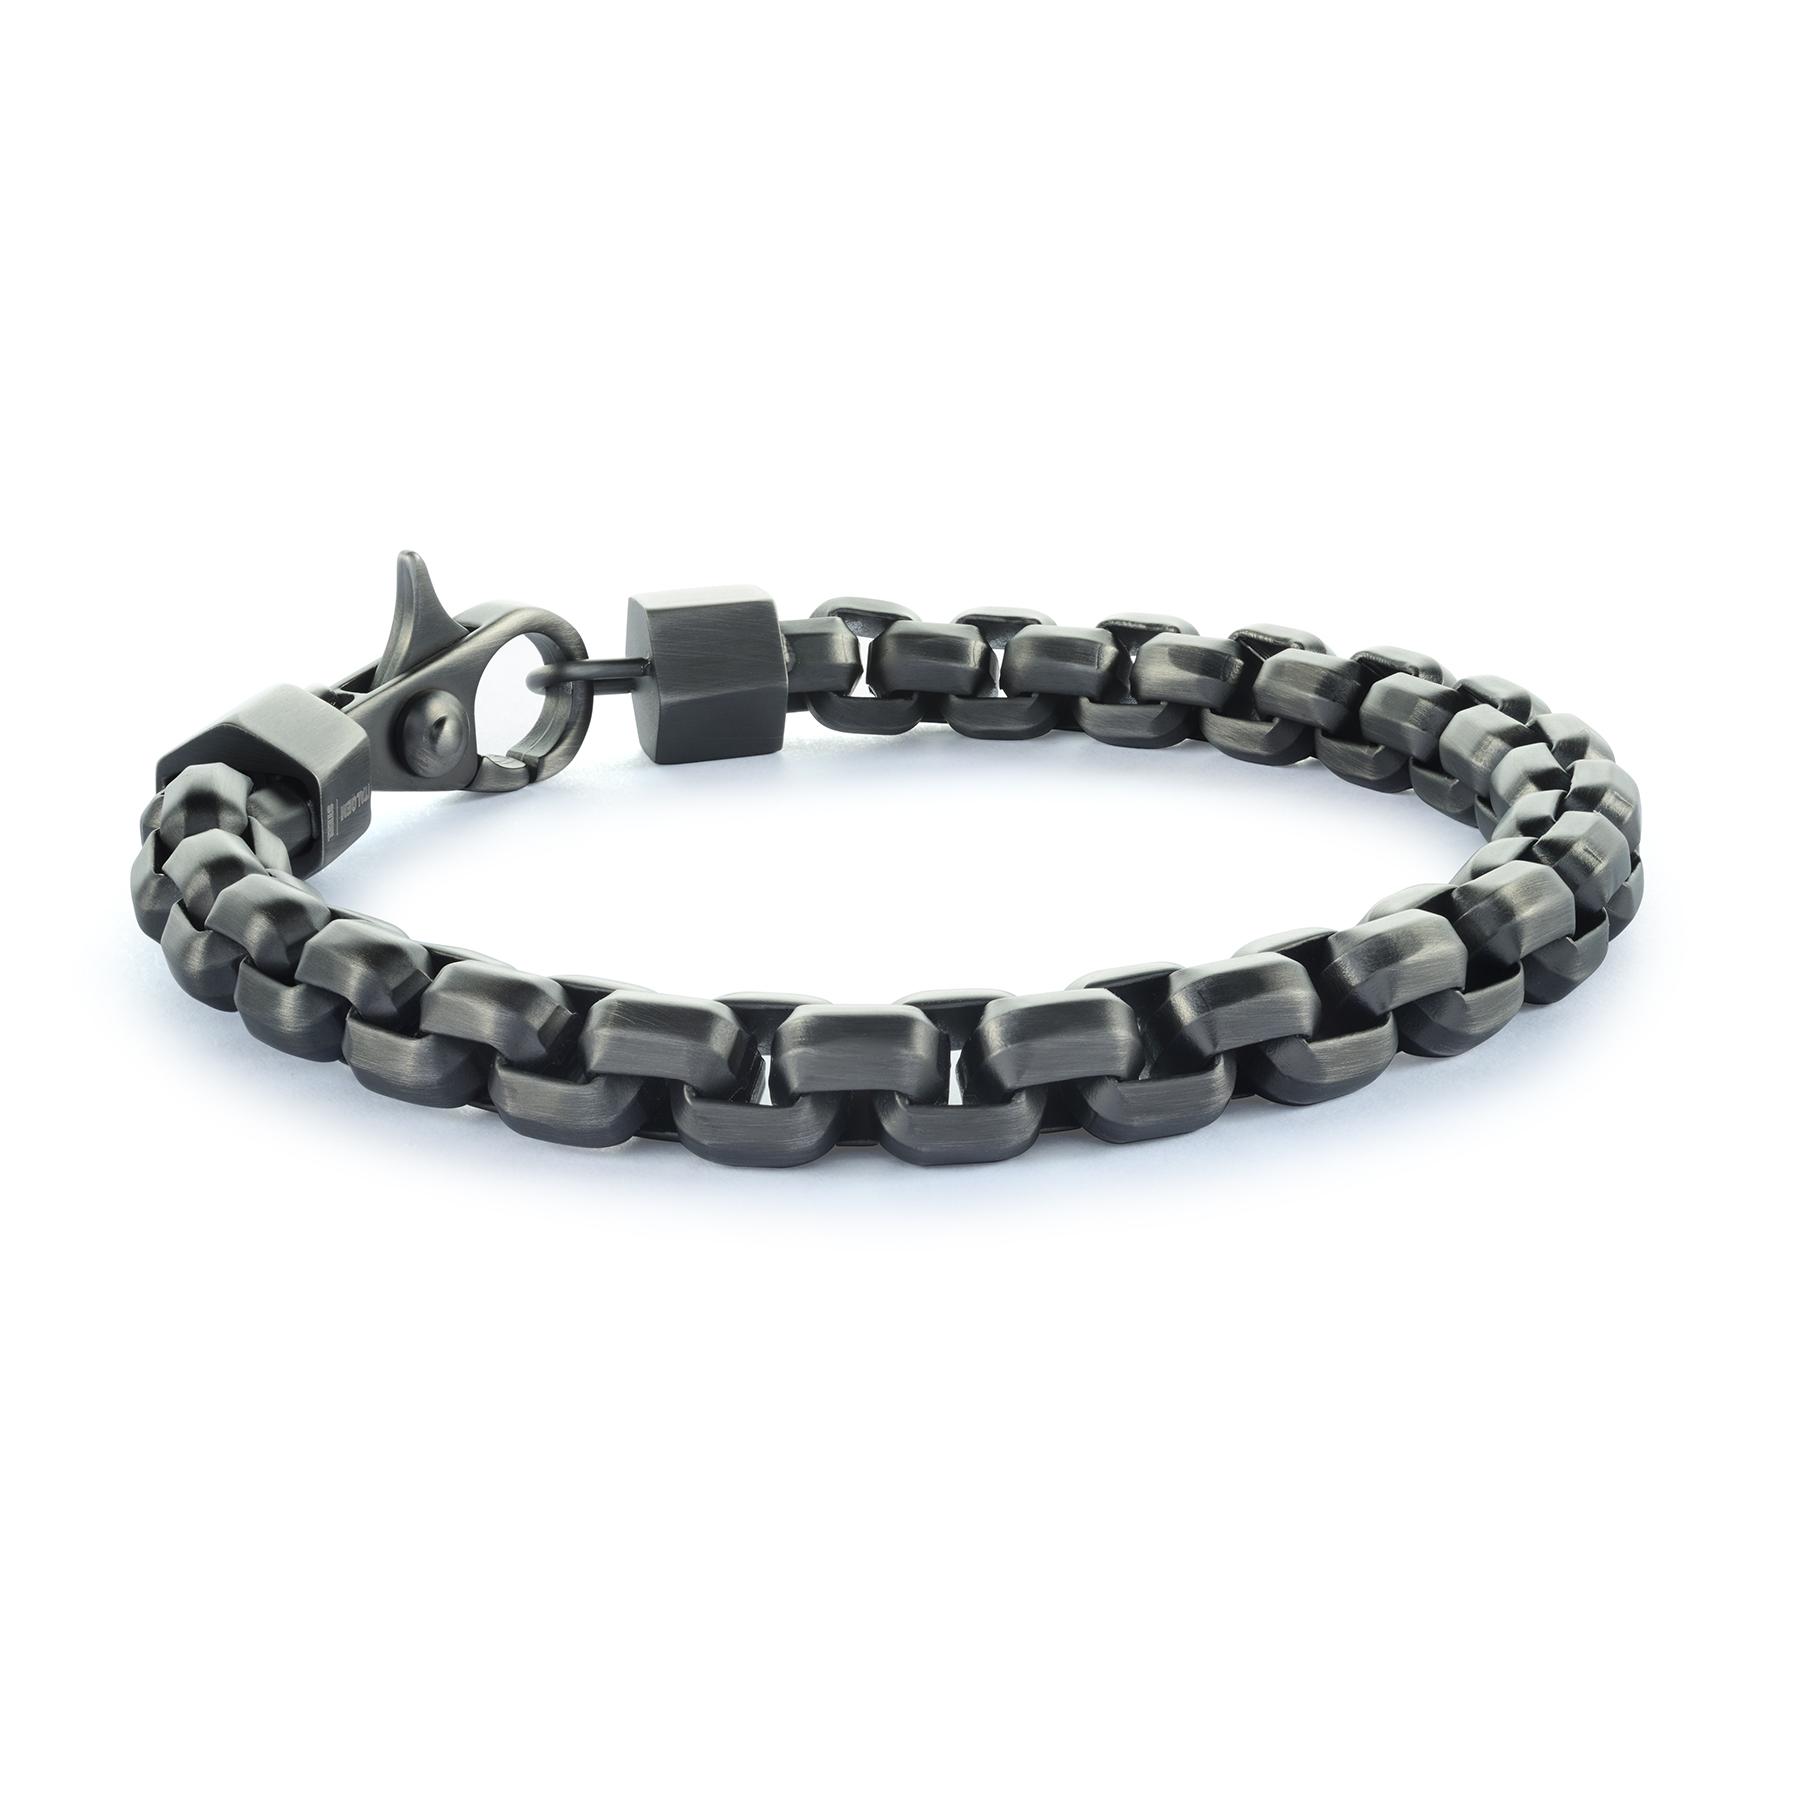 Bracelet - Acier inoxydable & fibre de carbone